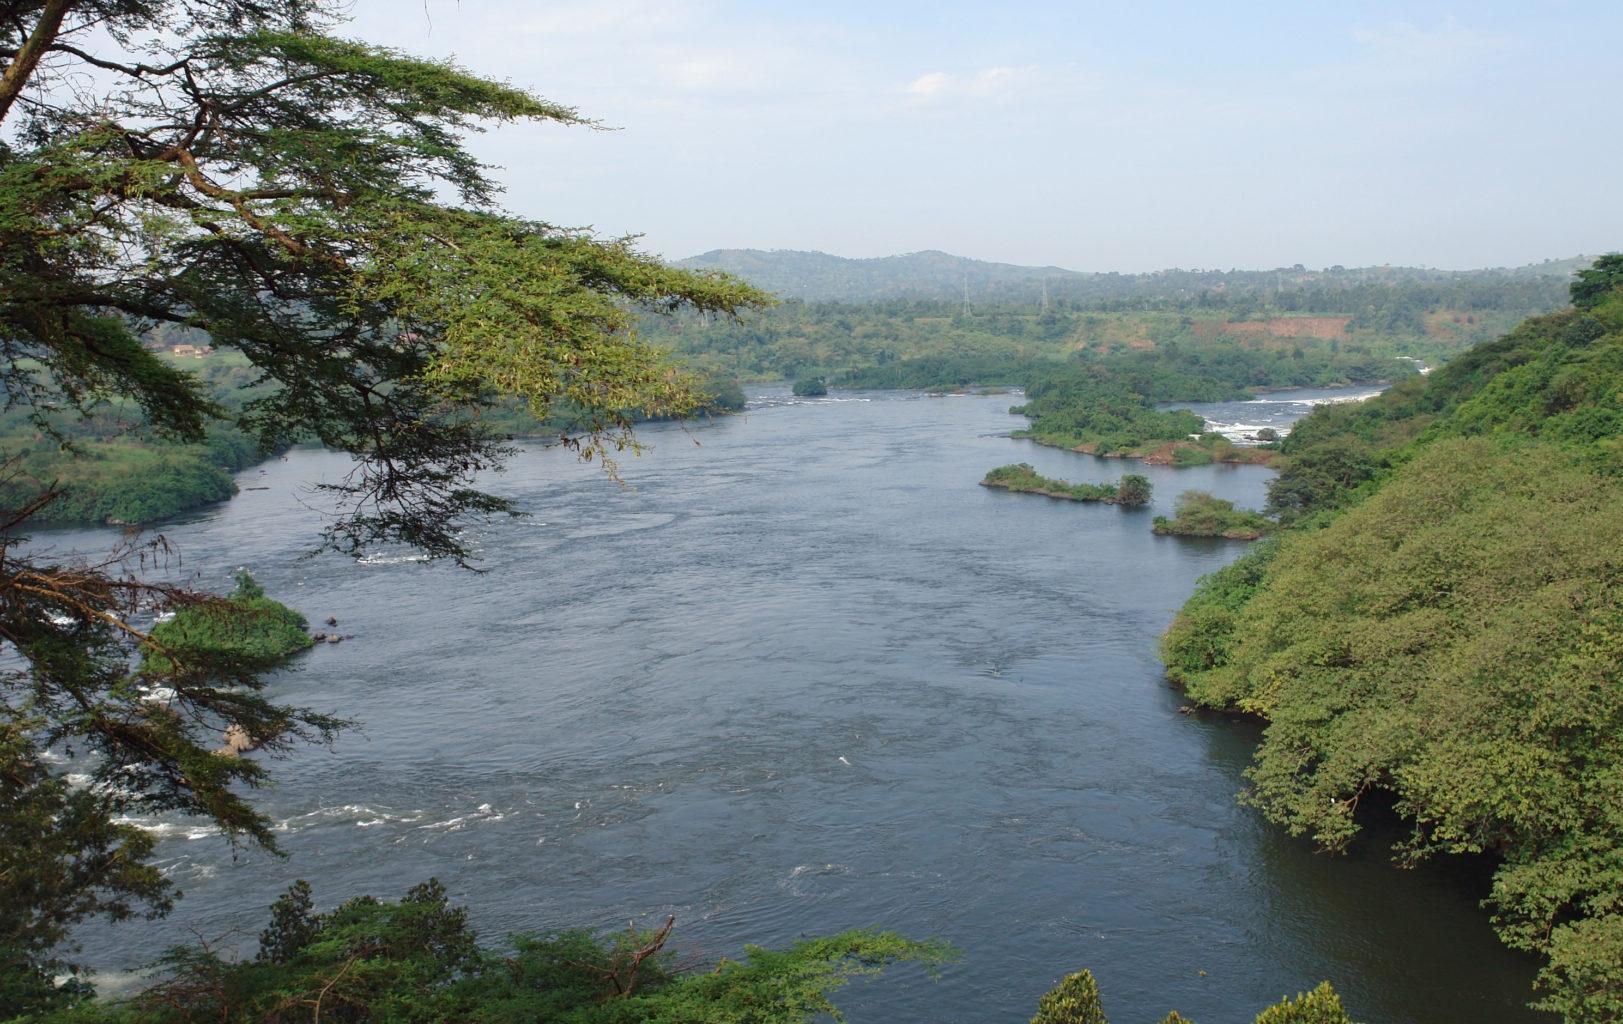 aerial view around the Bujagali Falls in Uganda (Africa)